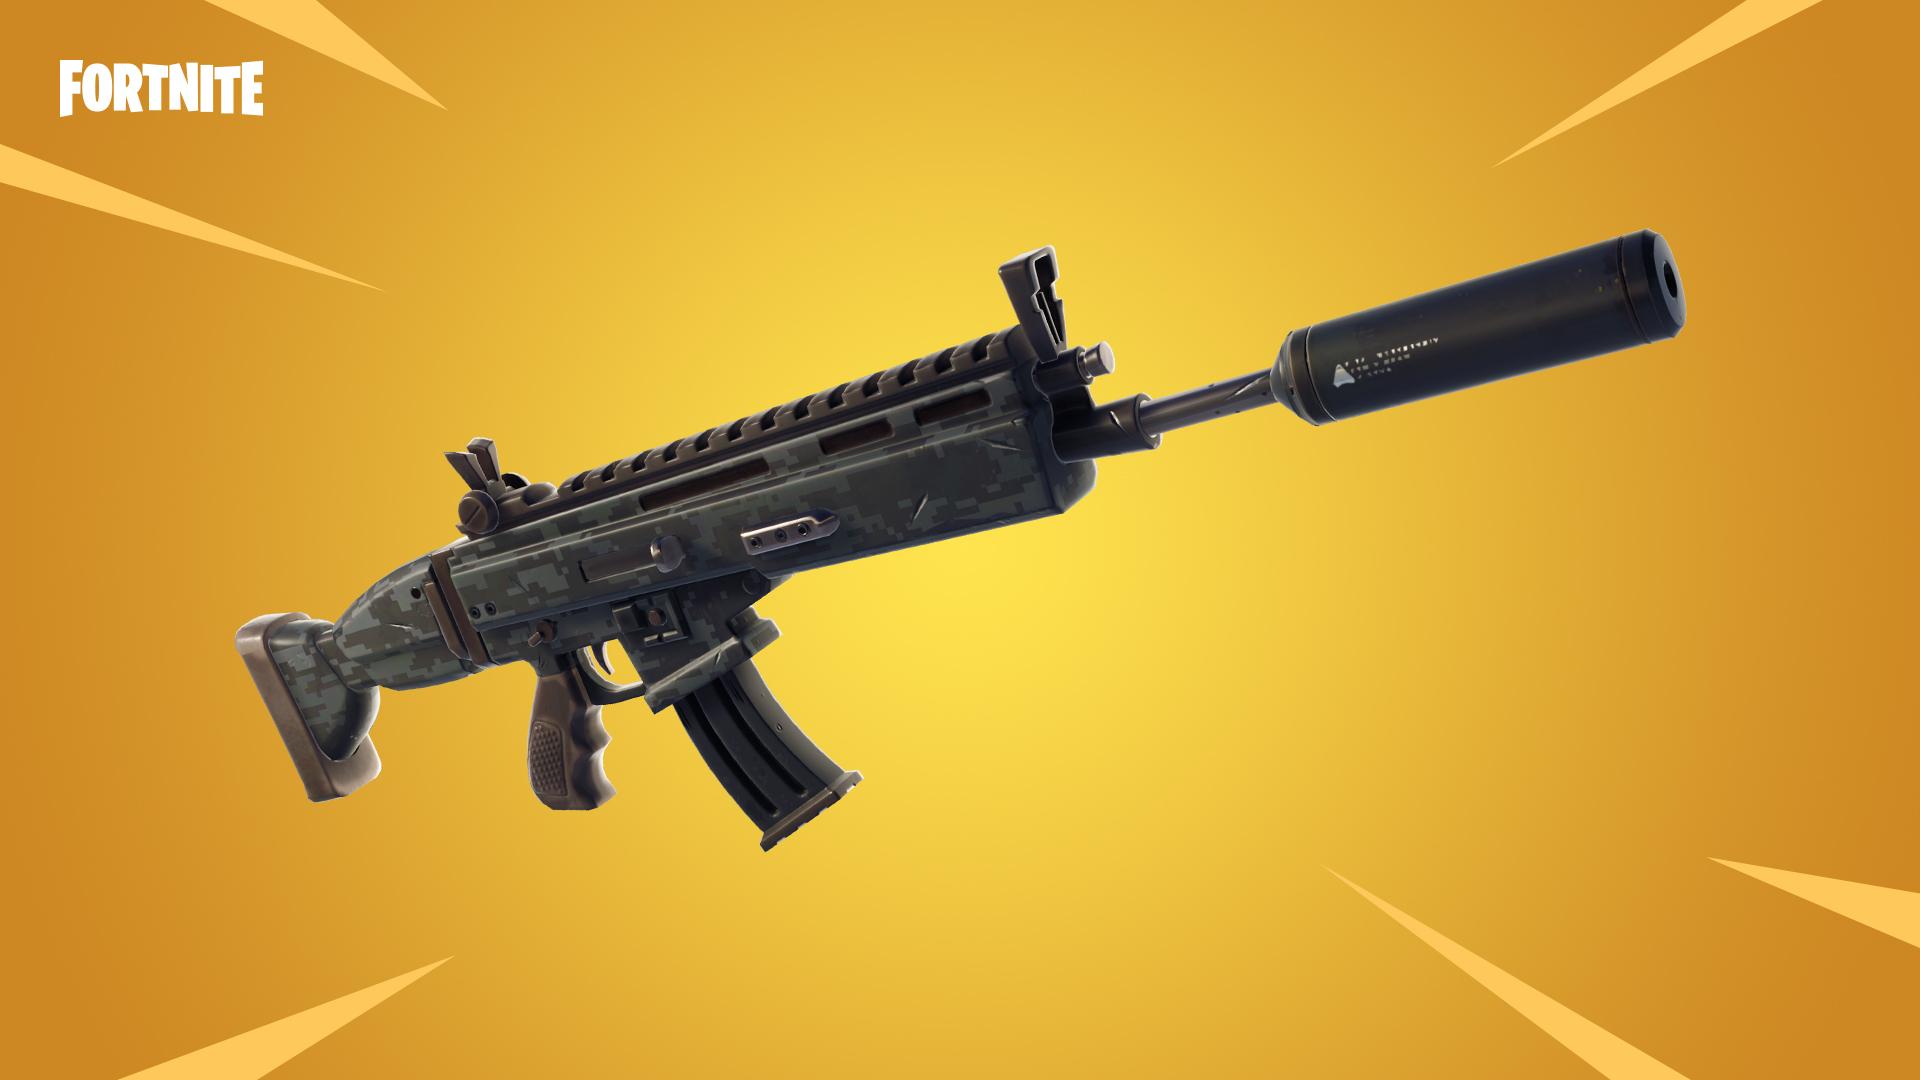 assualt rifle silenced v5.4 update content